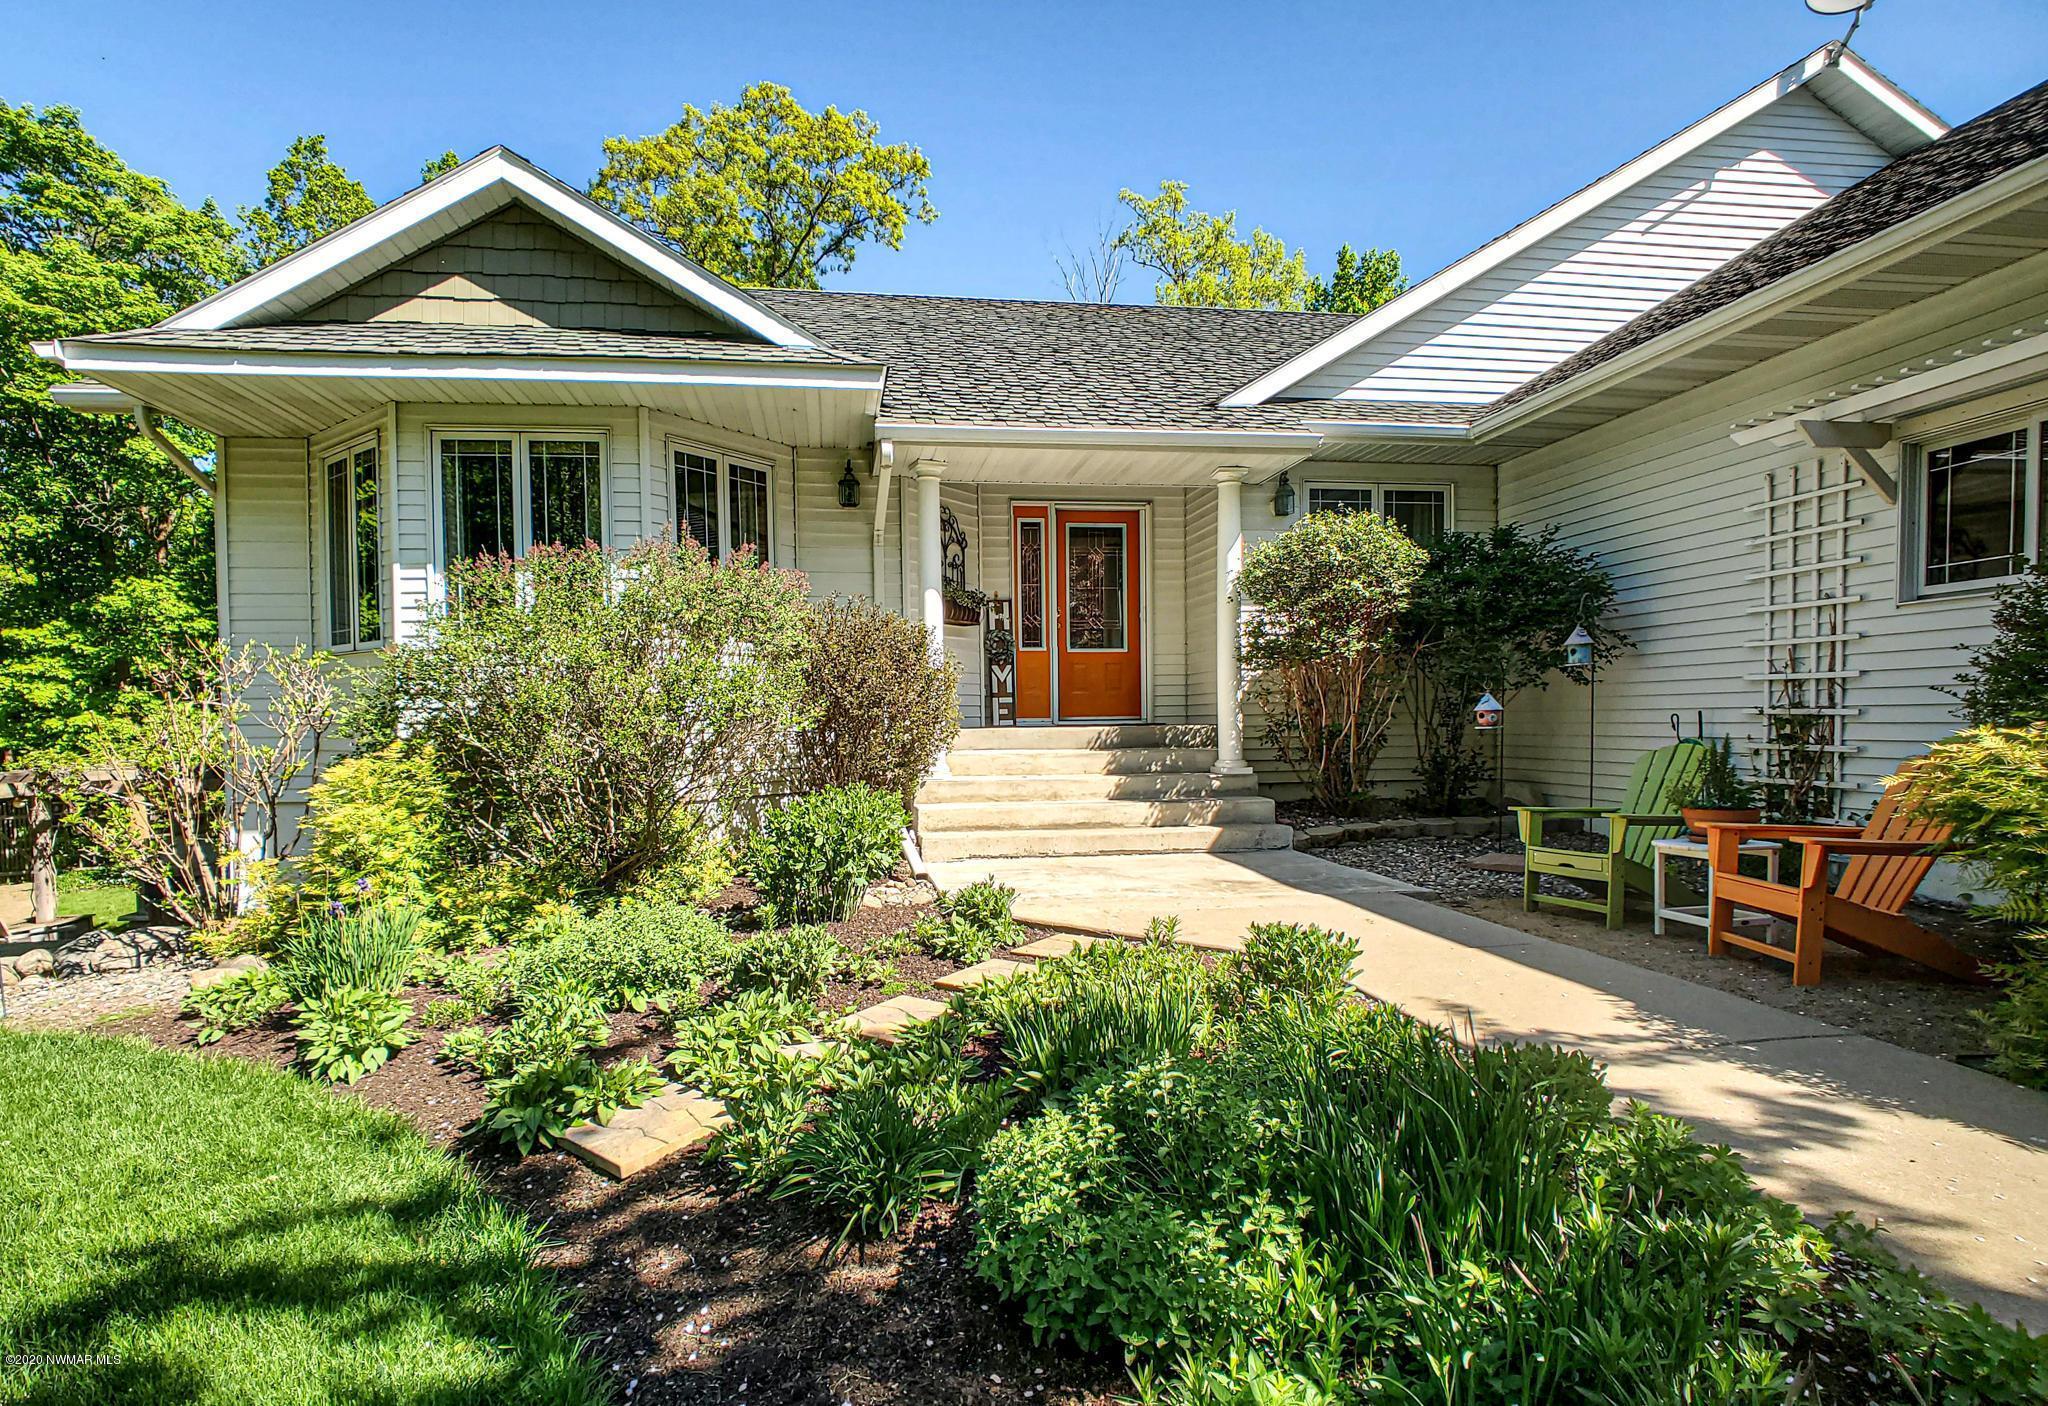 50160 219th Property Photo - Bemidji, MN real estate listing